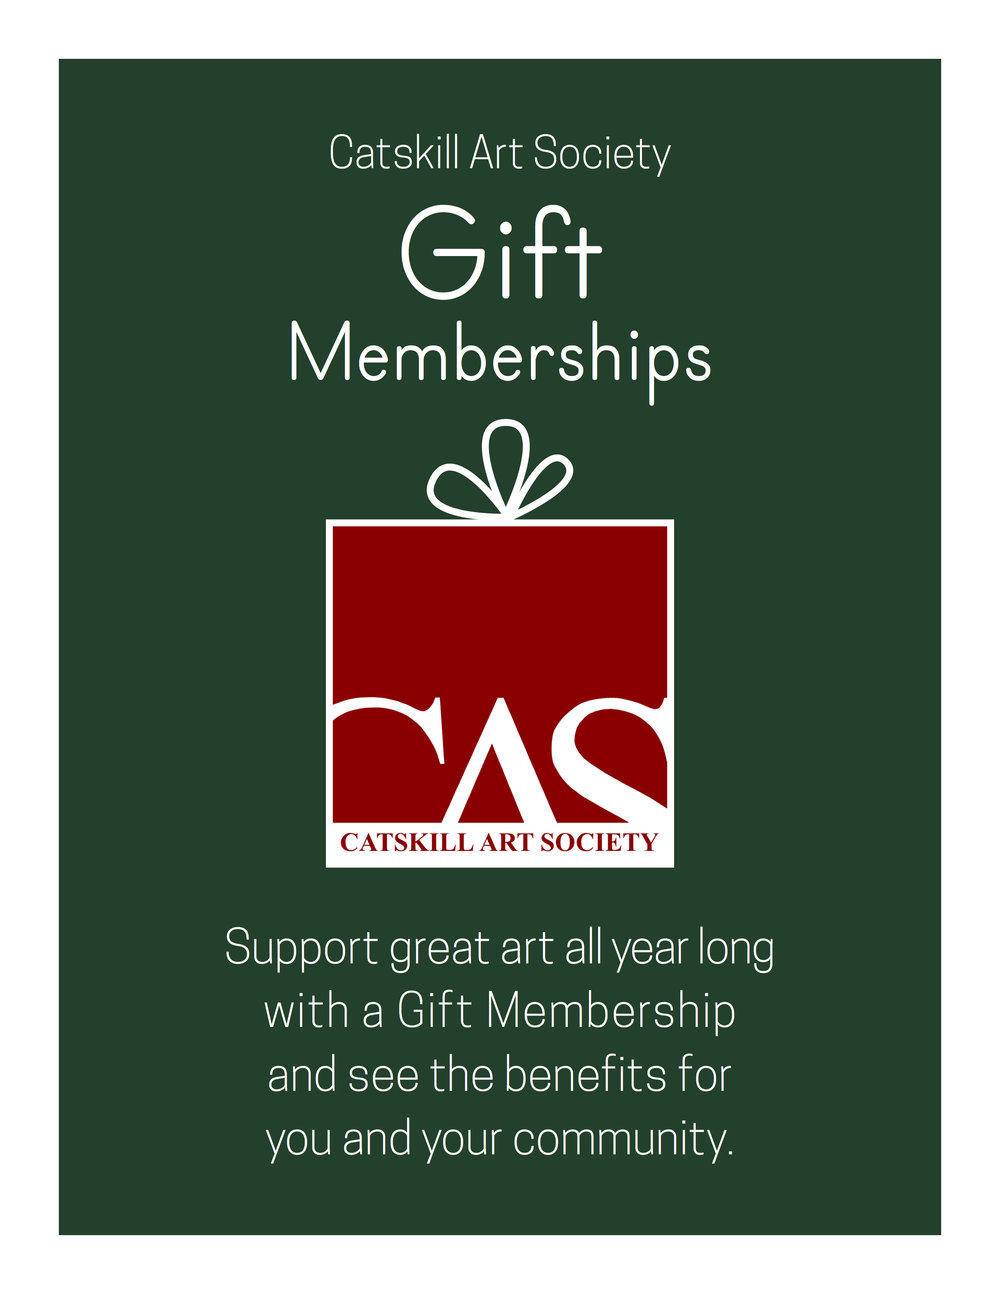 CAS Gift Membership Poster